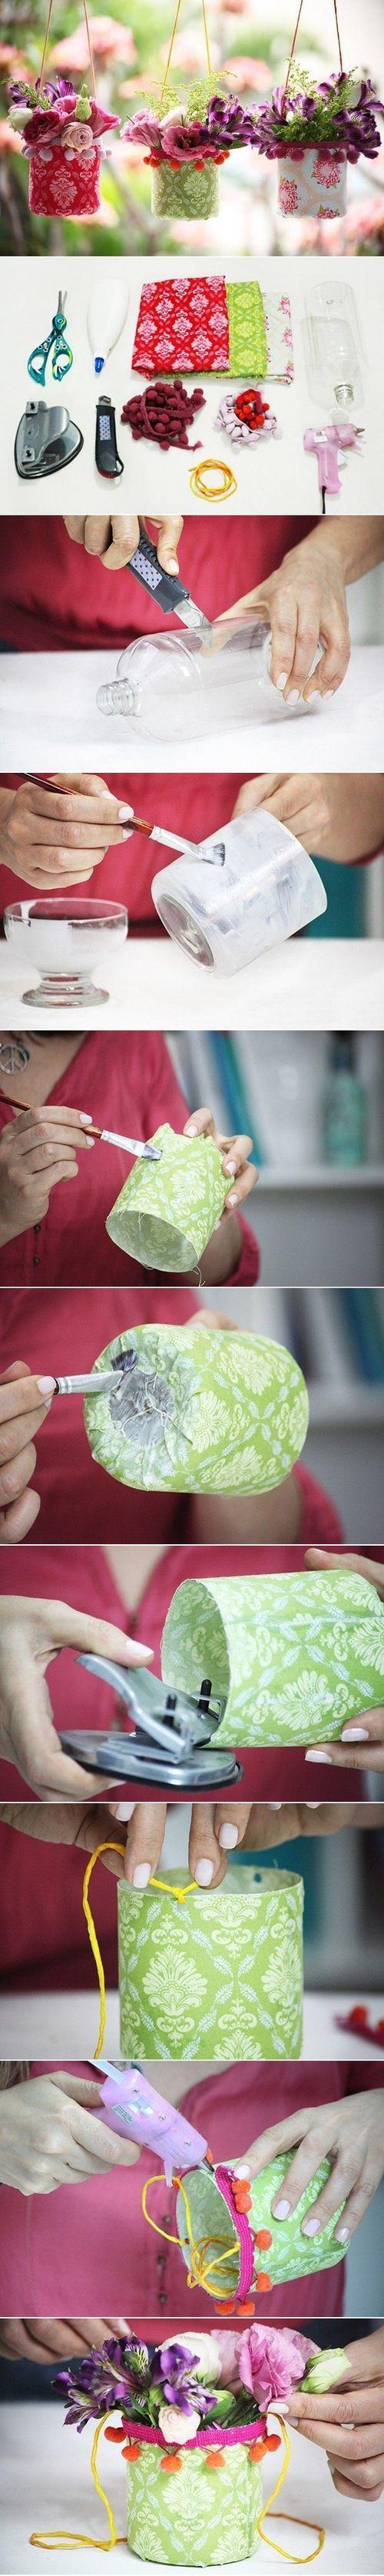 DIY Cute Plastic Bottle Hanging Vase / UsefulDIY.com